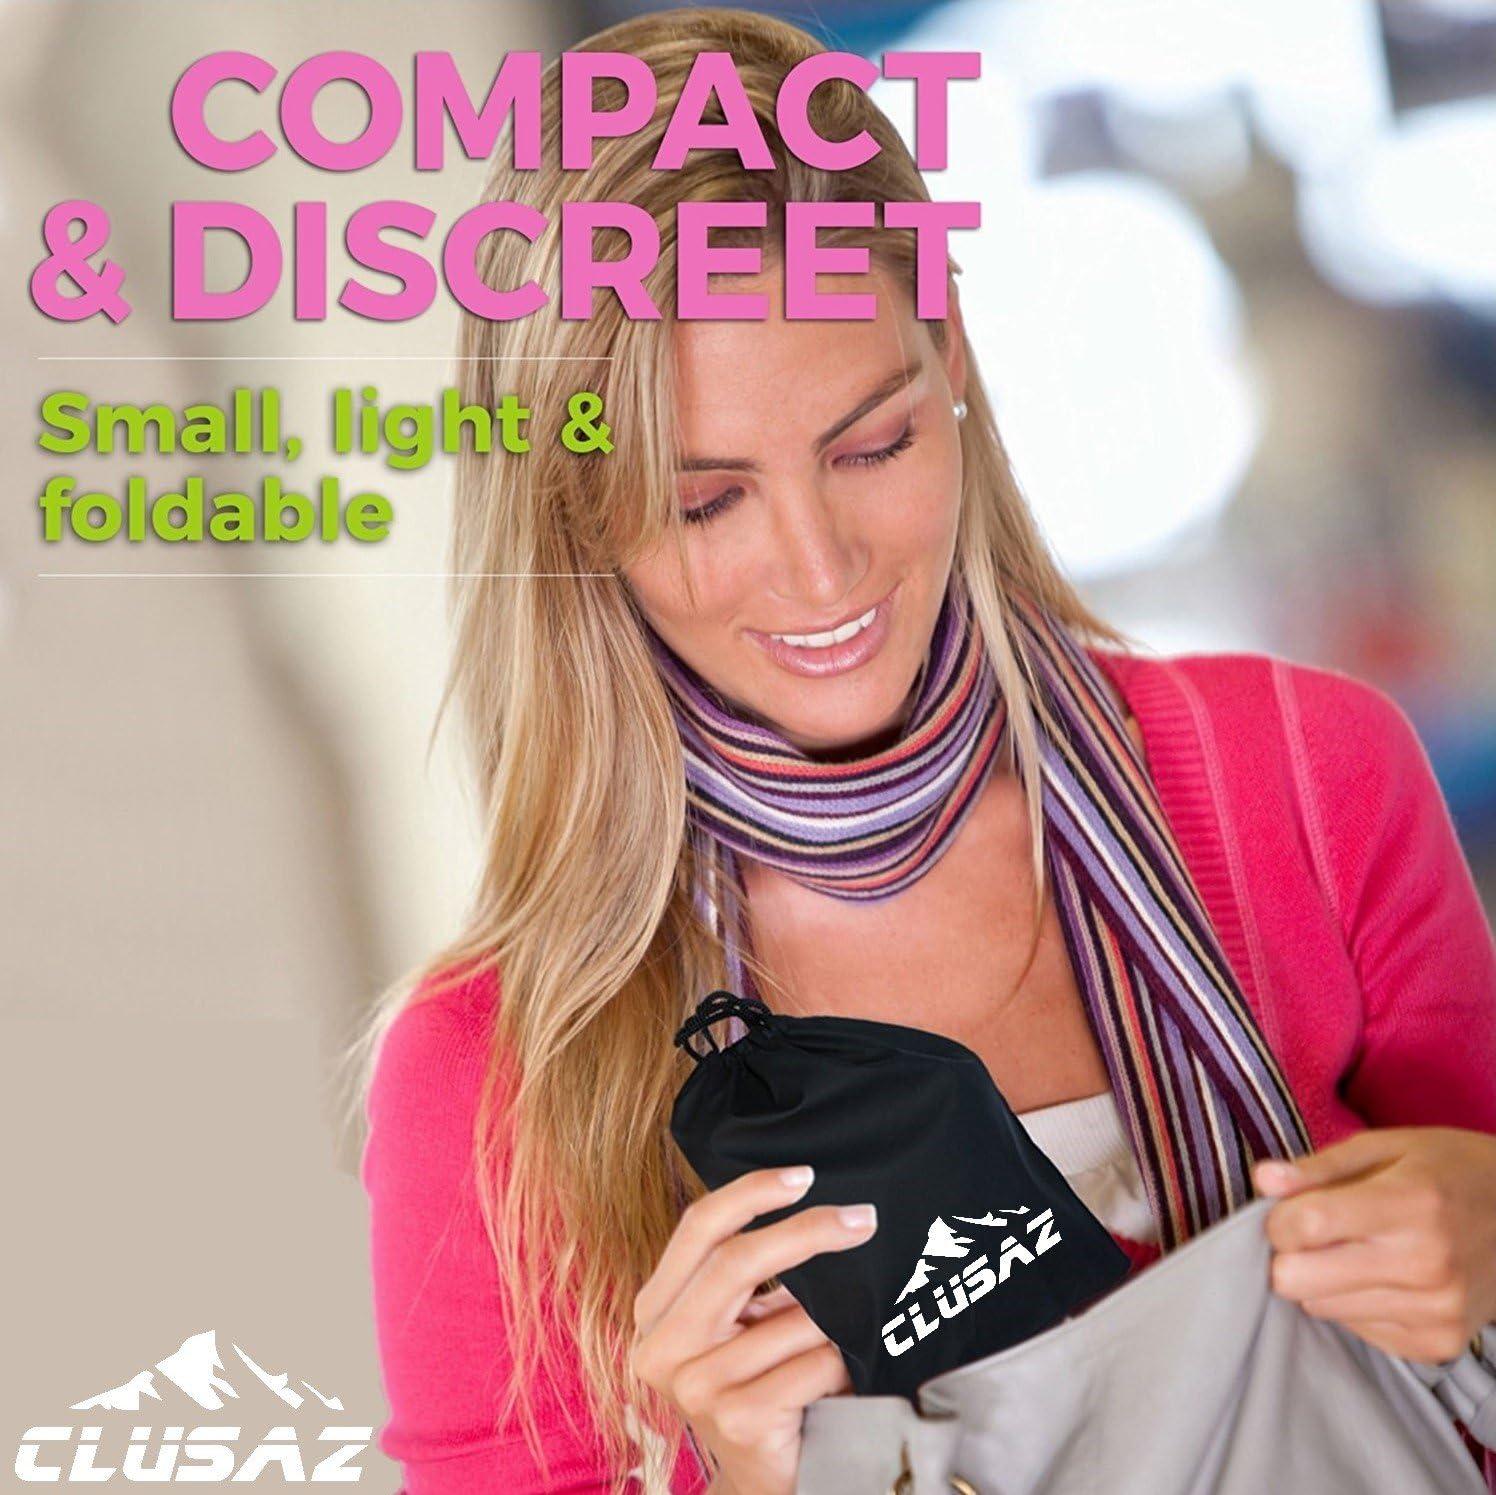 CLUSAZ Dispositivo Urinario Port/átil Feminino Rosa para Orinar de Pie